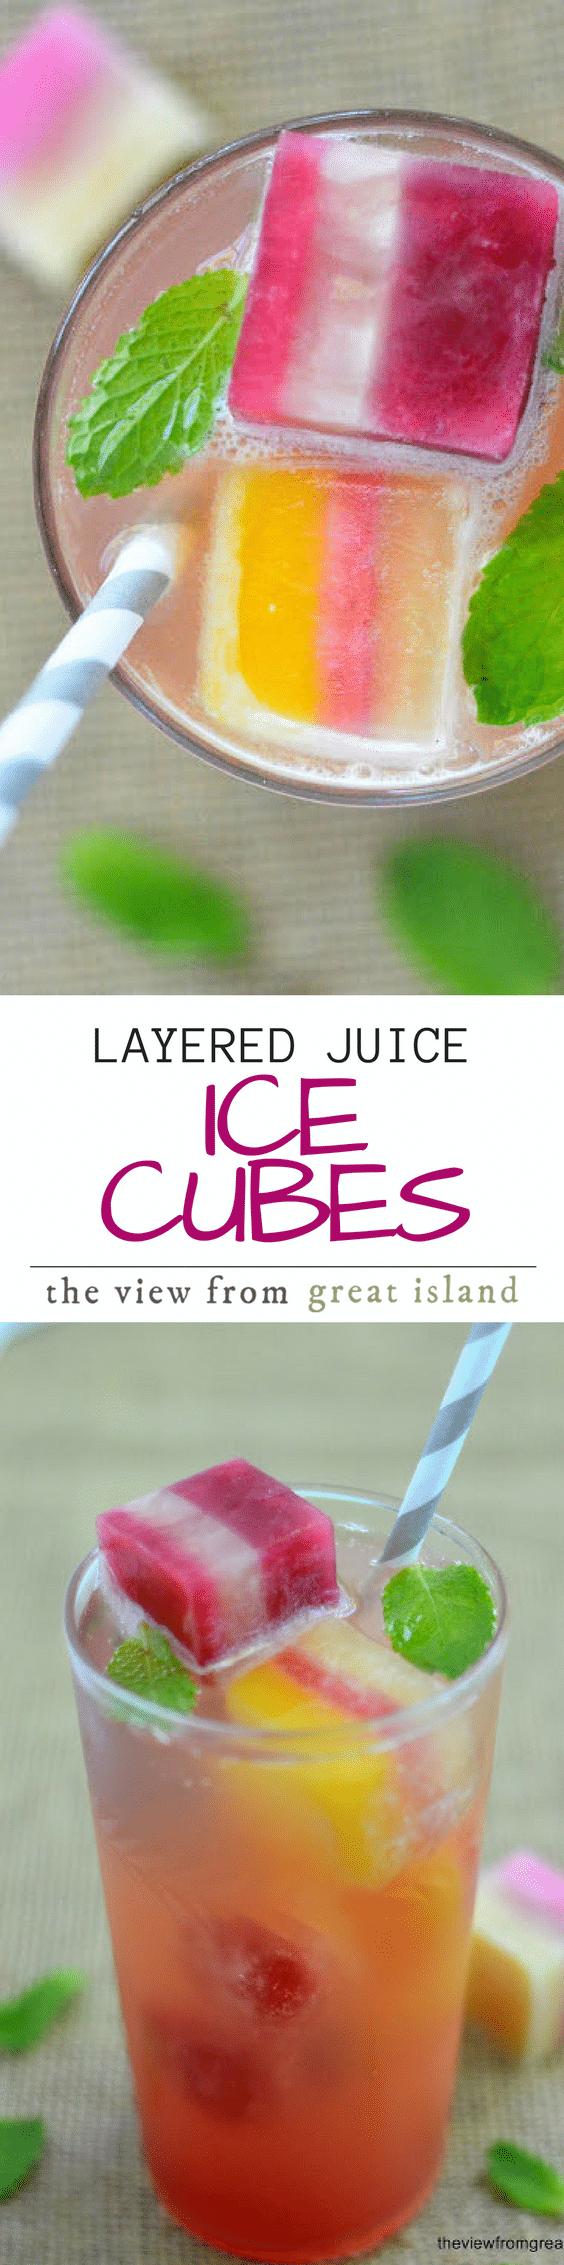 Layered ice cubes pin